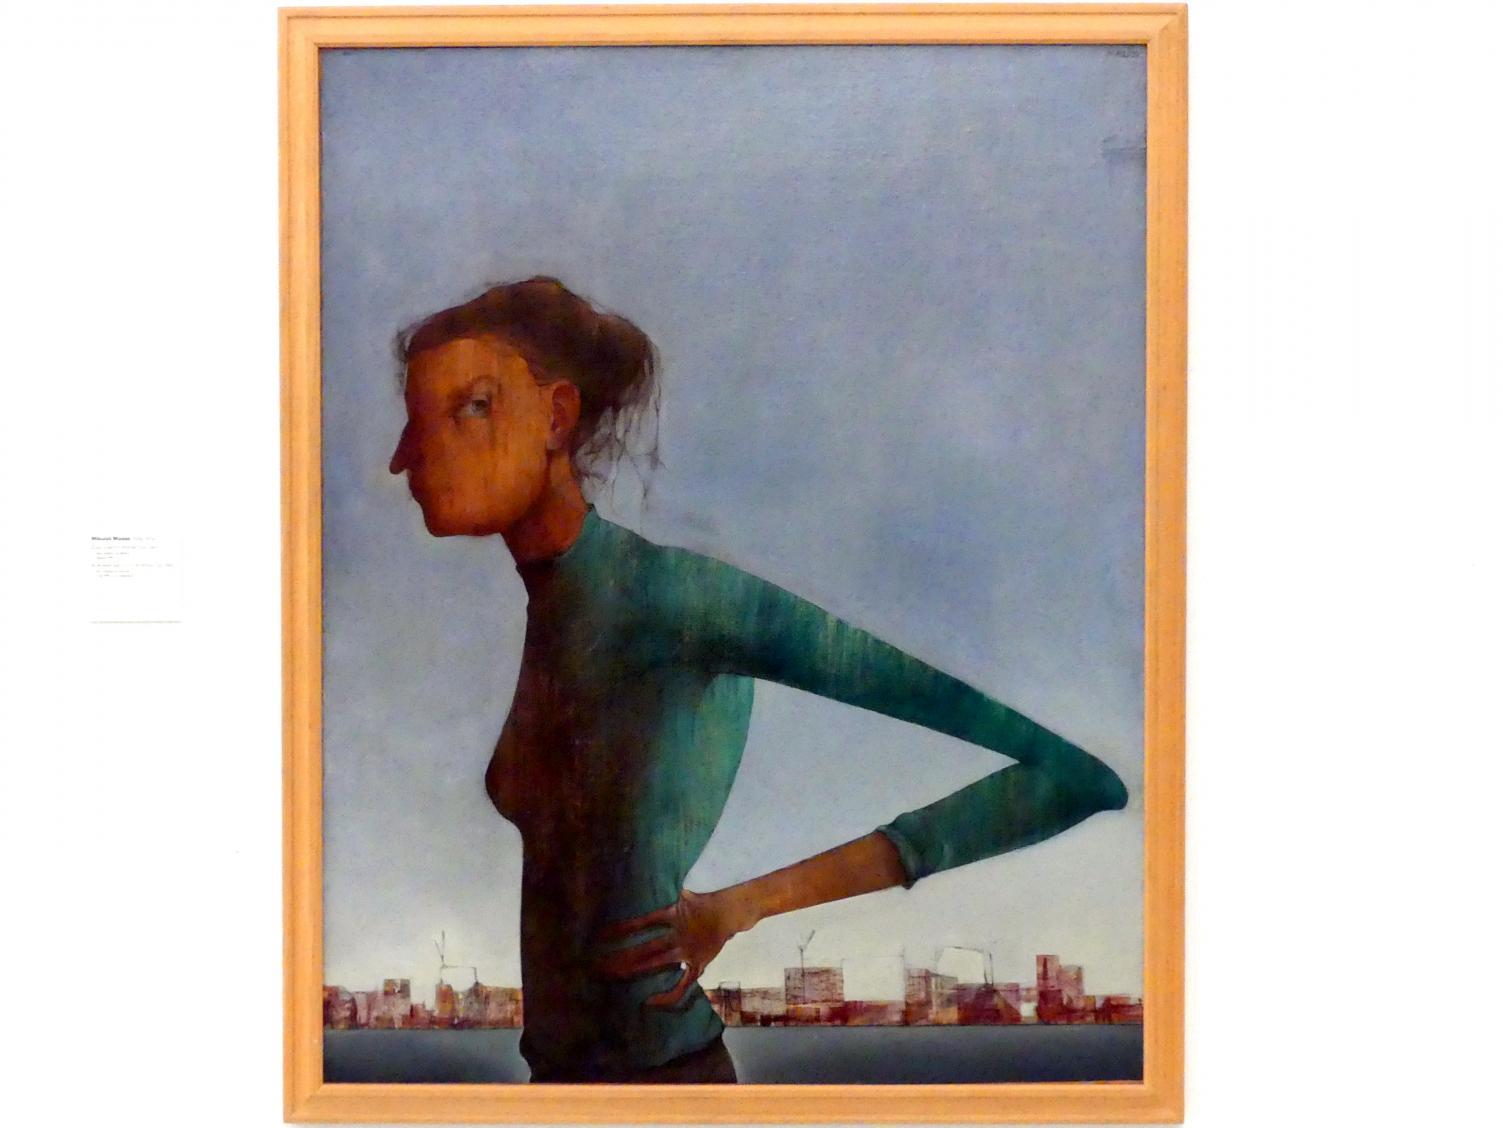 Mikuláš Medek: Frau und Stadt (Porträt 53), 1953